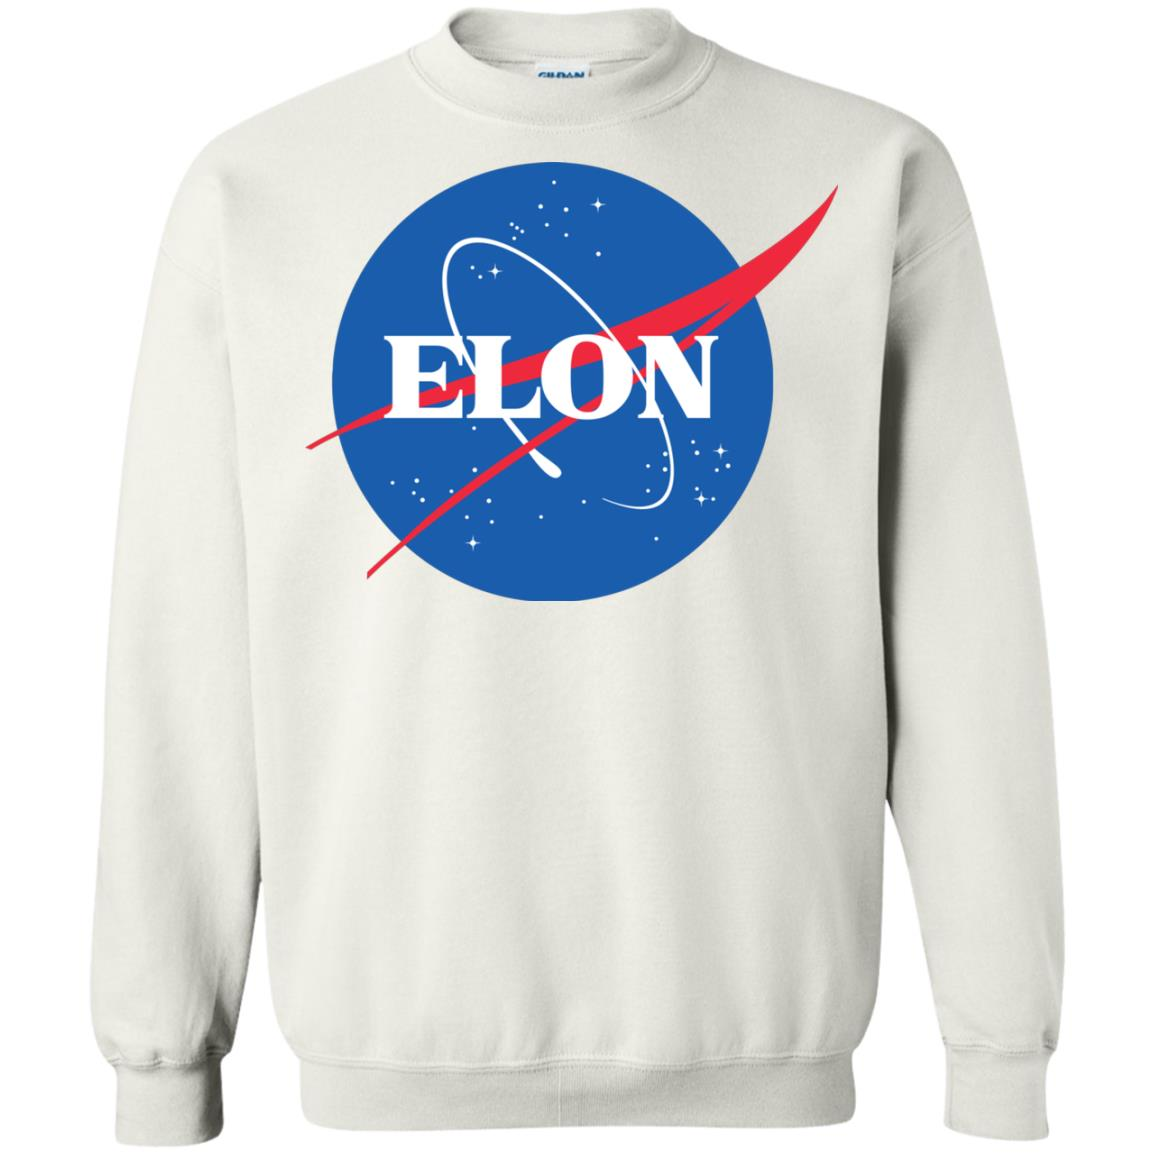 image 290px Elon Nasa parody t shirt, hoodies, tank top